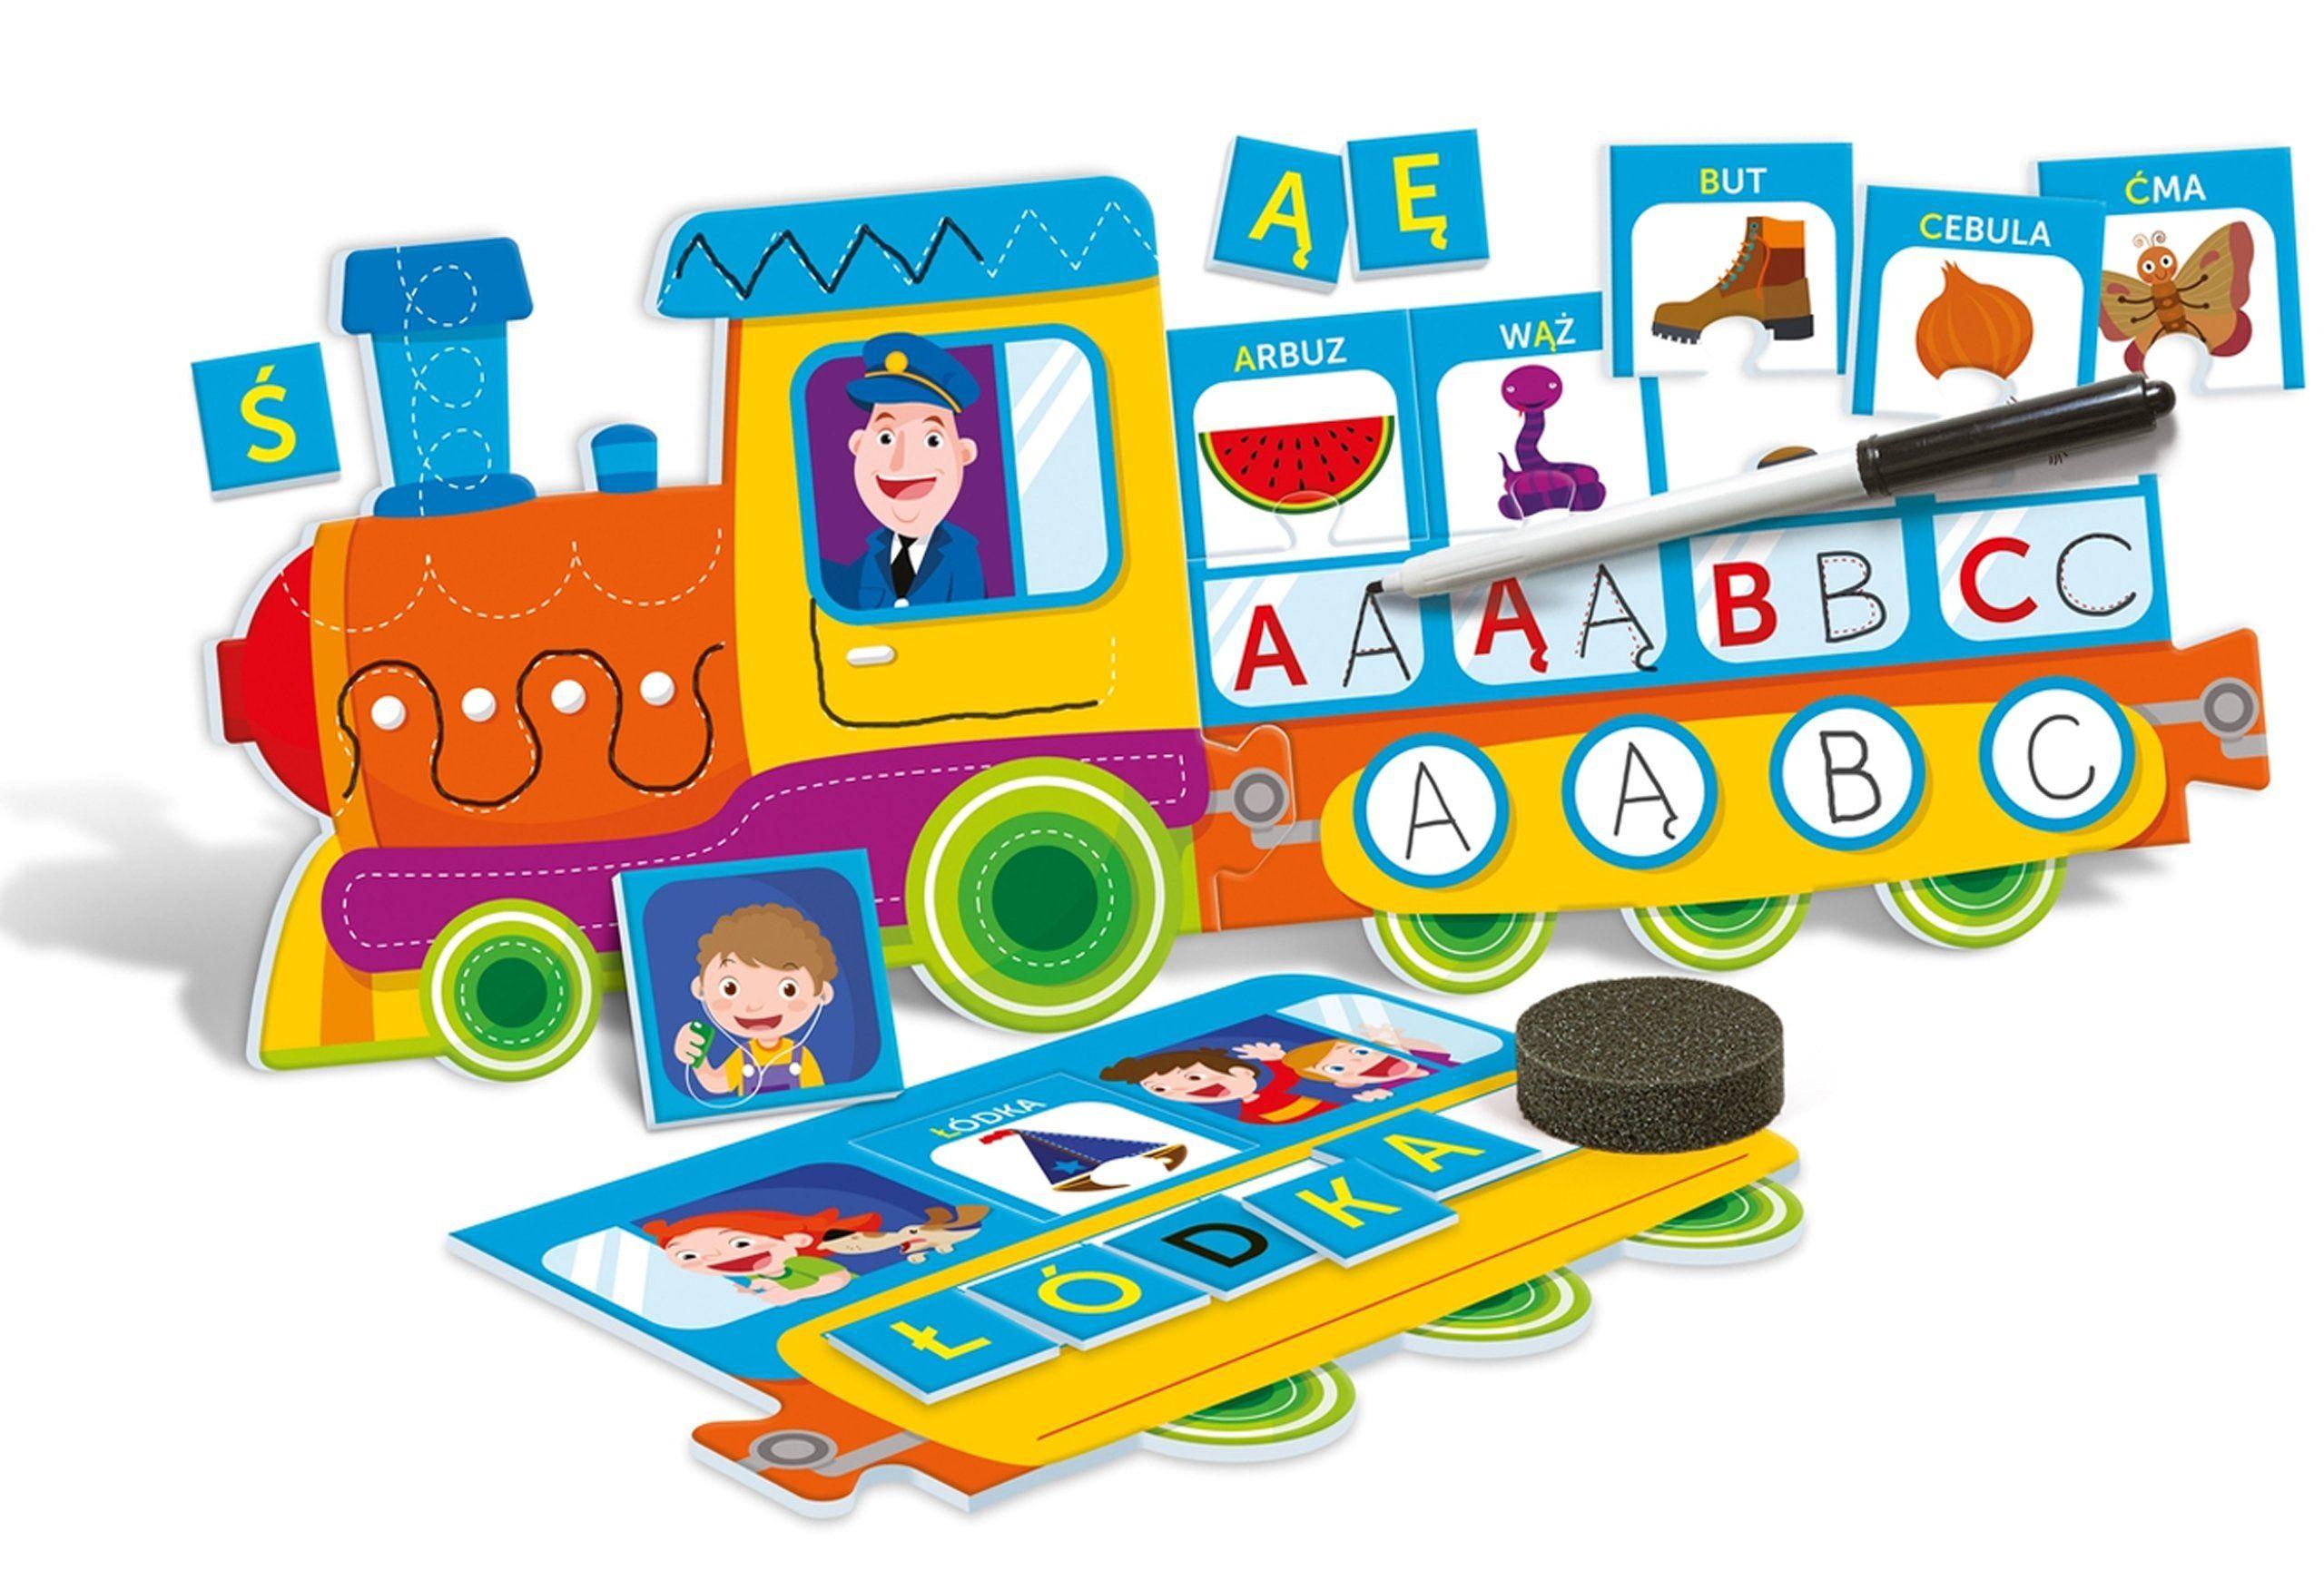 Literkowy Pociag Gra Edukacyjna Puzzle Clementoni Puzzle Gra